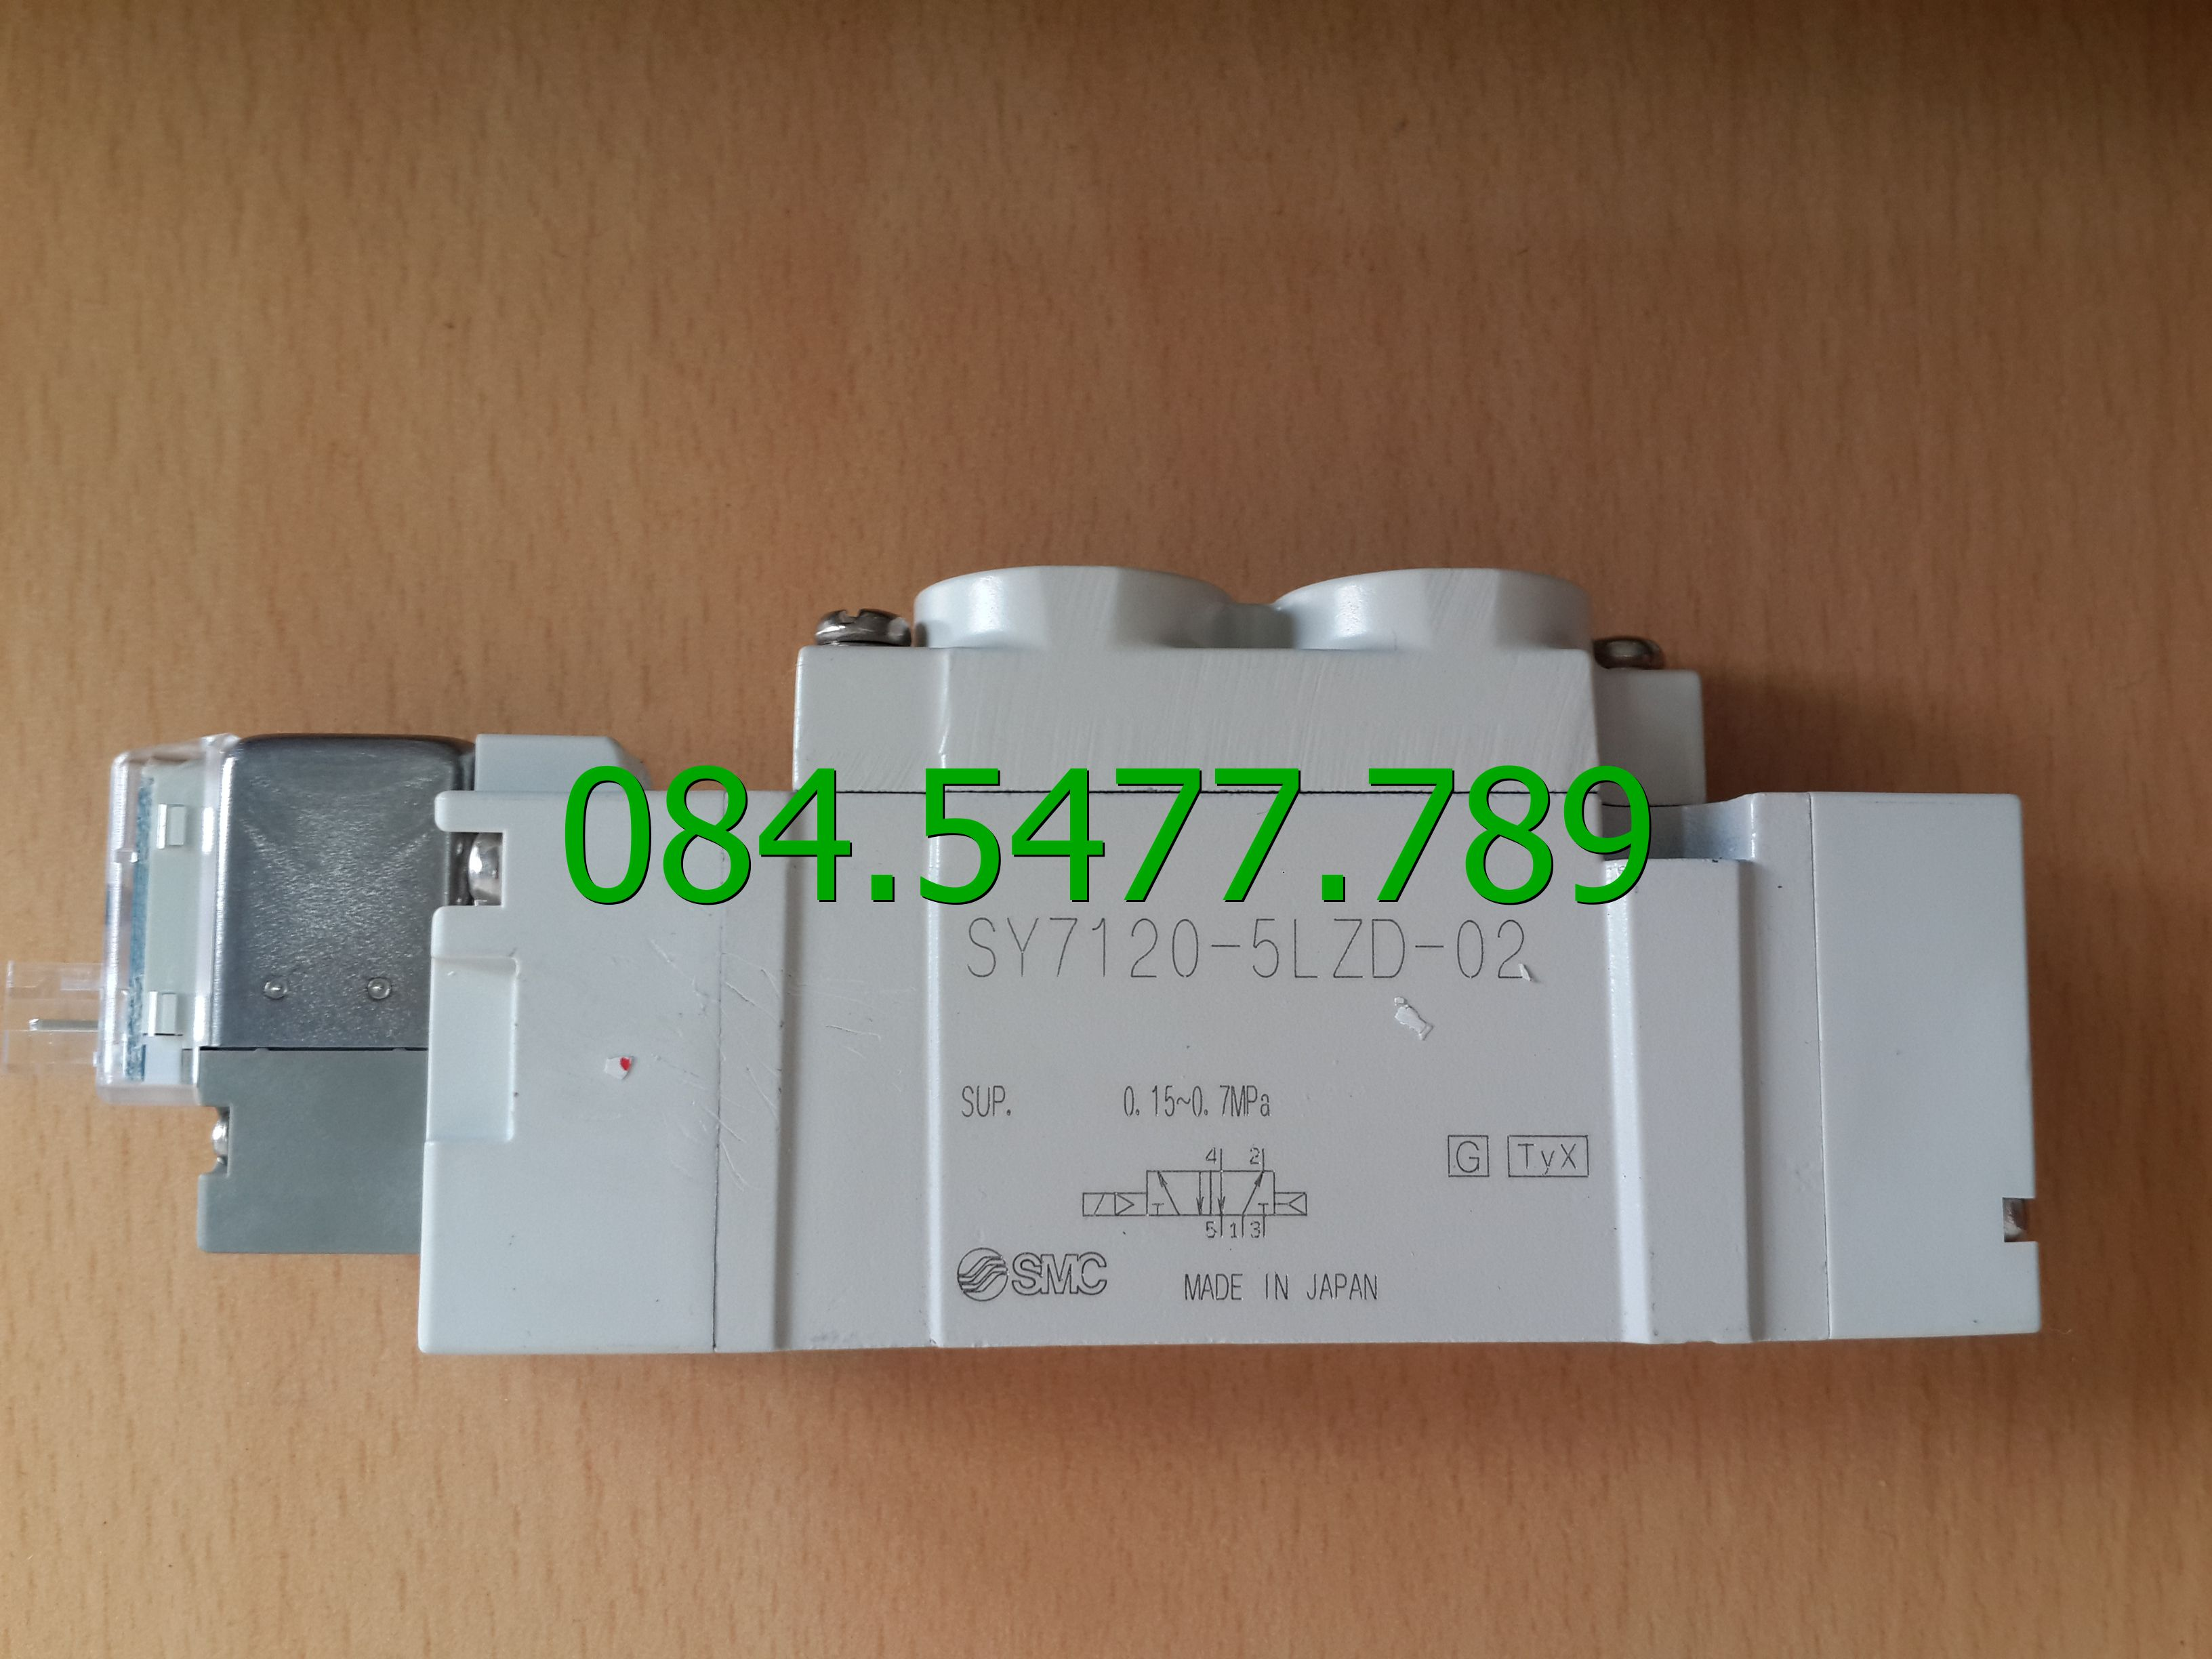 Van điện SY7120-5LZD-02